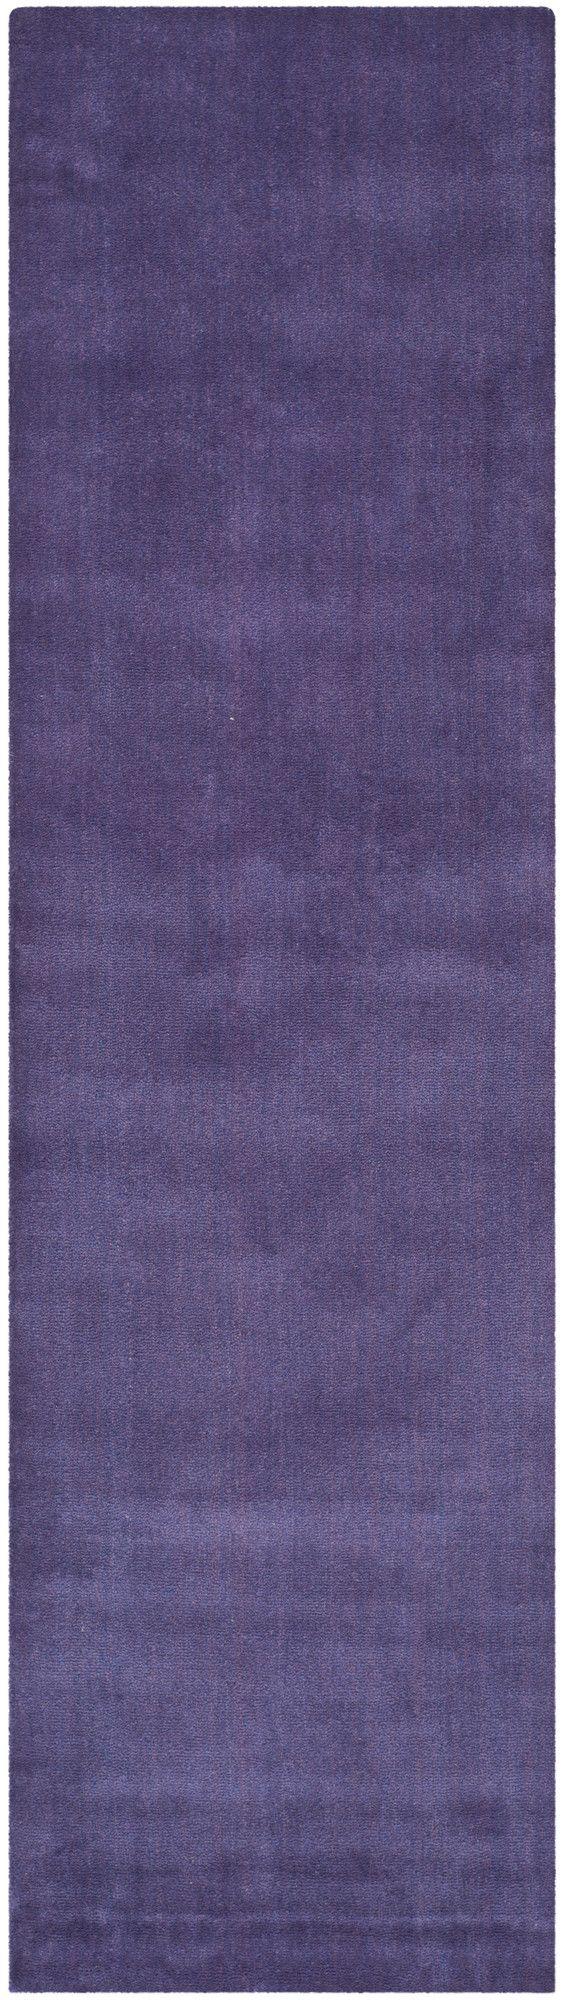 Himalayan Purple Area Rug